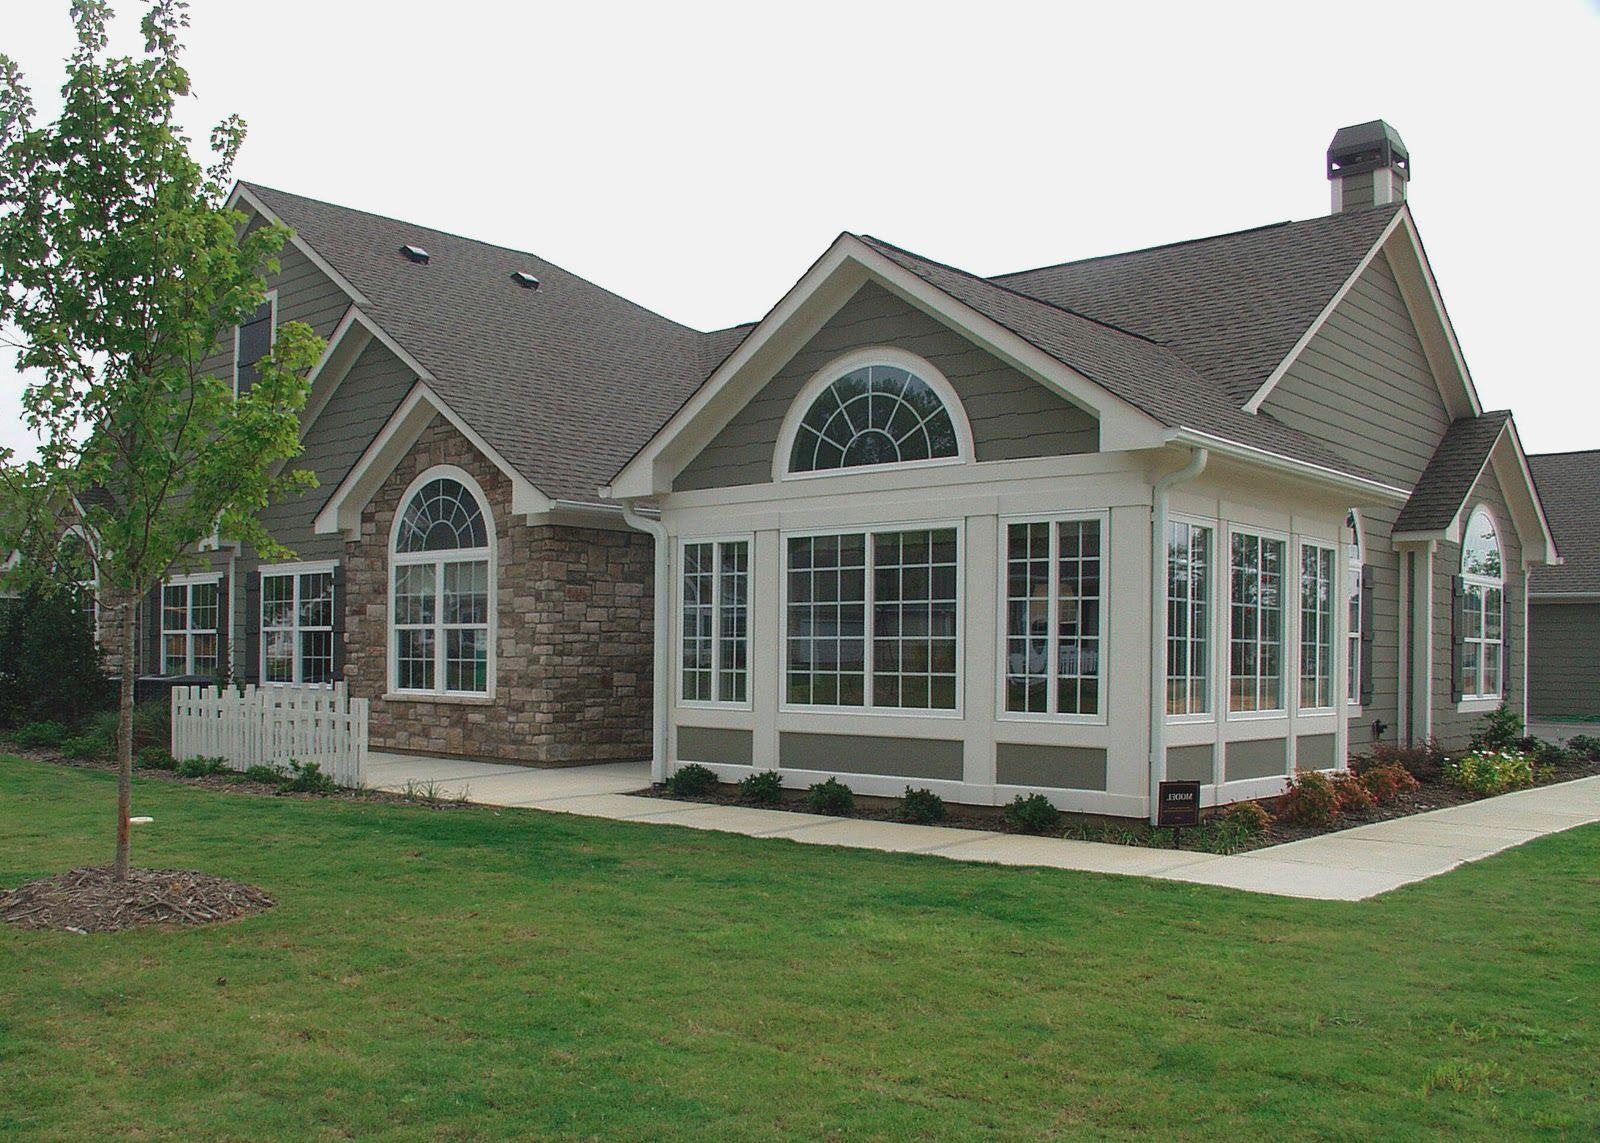 Ranch Style House Siding Google Search Brick Amp Siding